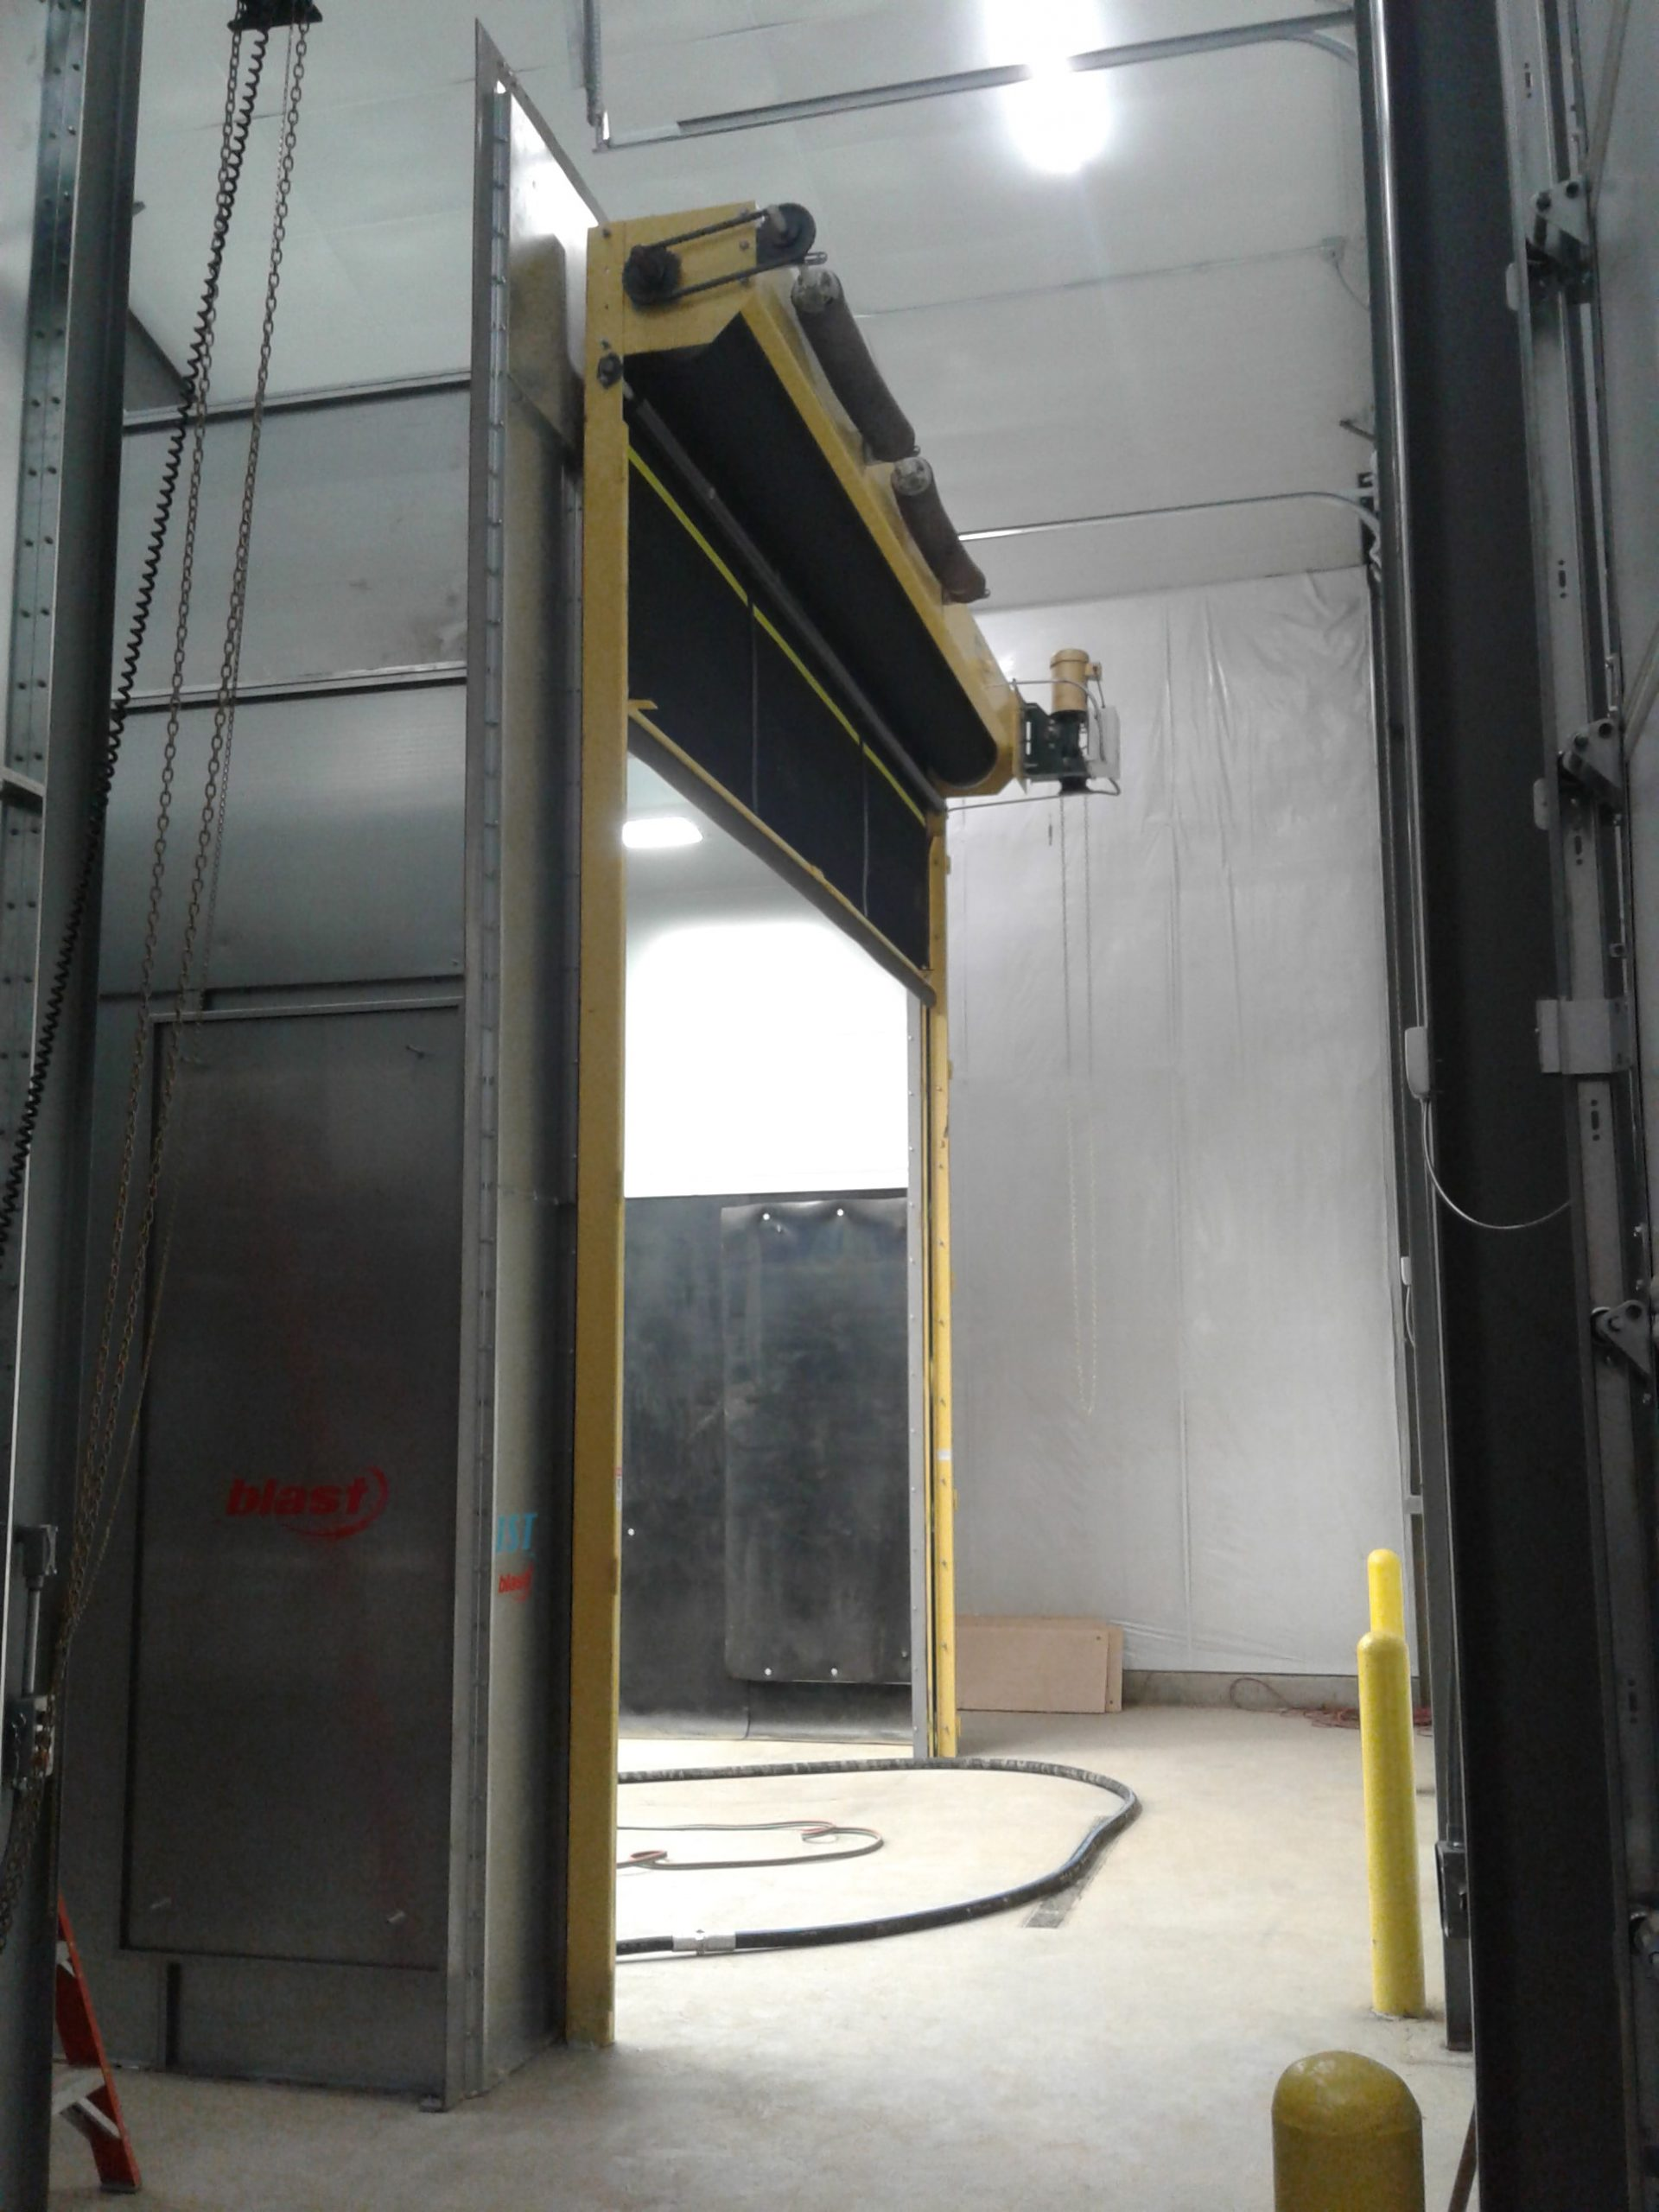 Blast Booth with Rubber Roll-Up Door Open